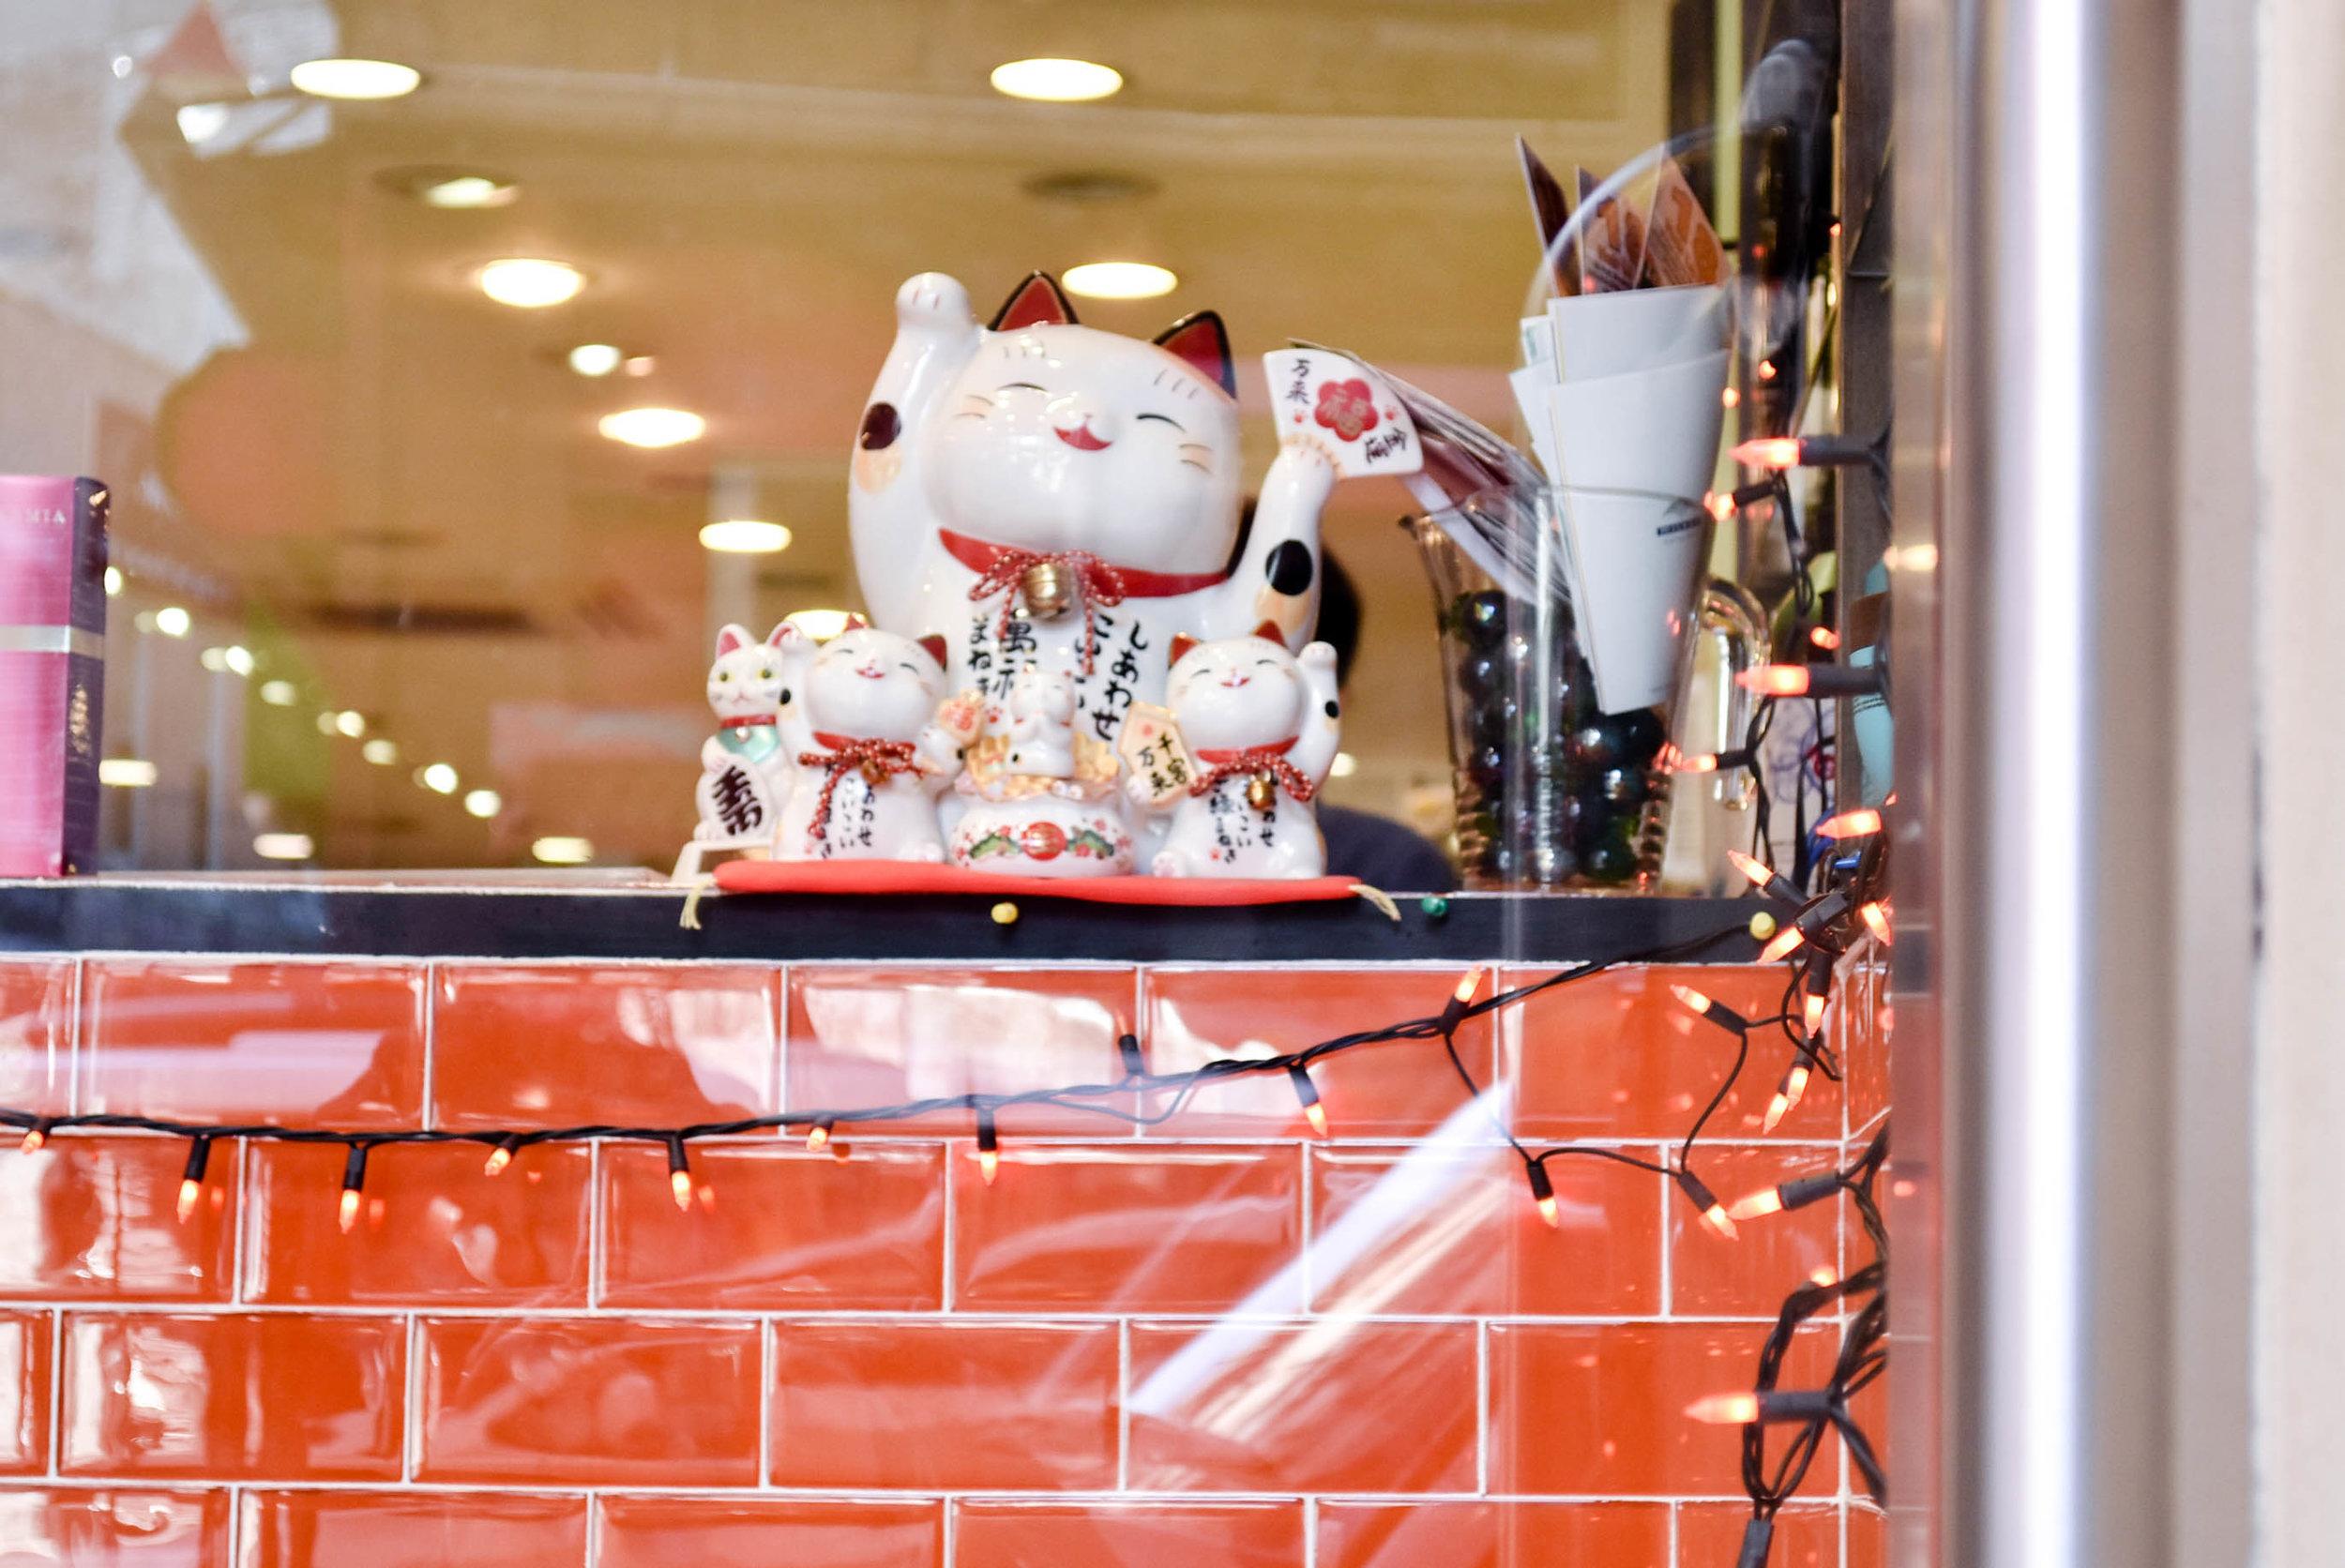 Ceramic Cats on a Window, Chinatown, NYC - Nov 2016